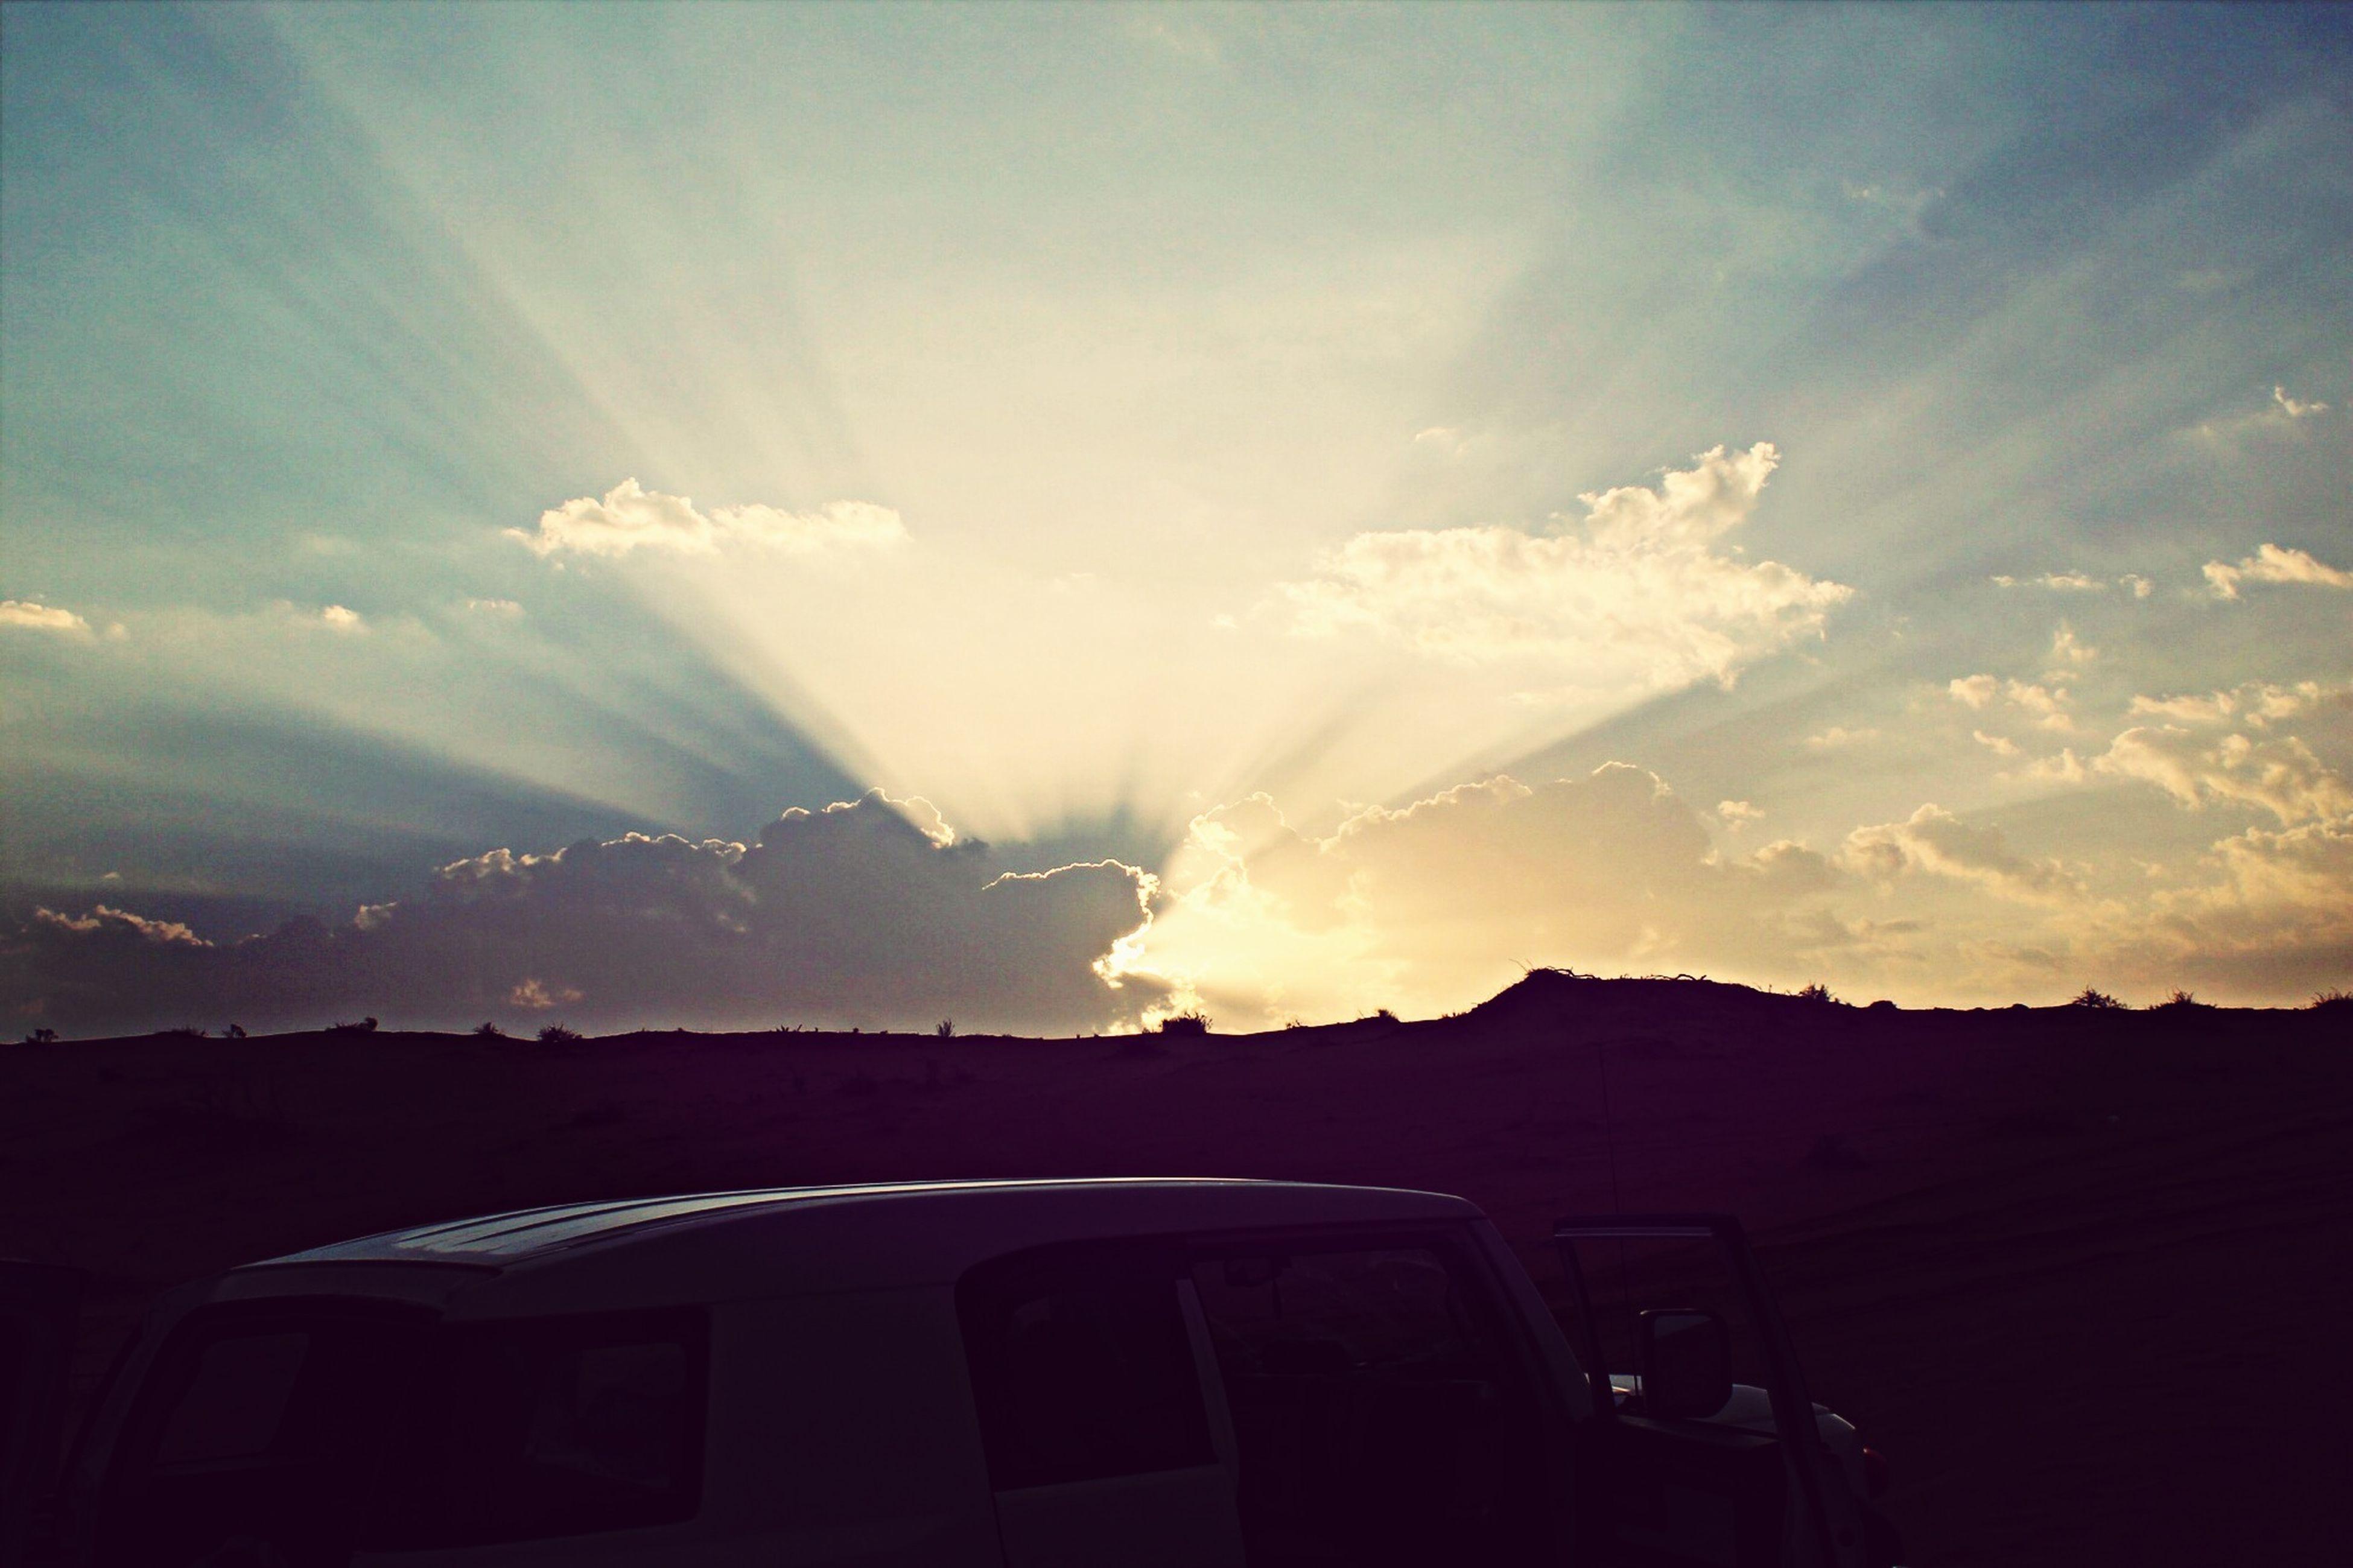 sun, sunbeam, sunset, sky, sunlight, scenics, lens flare, beauty in nature, cloud - sky, landscape, silhouette, nature, tranquil scene, tranquility, mountain, cloud, idyllic, bright, outdoors, building exterior